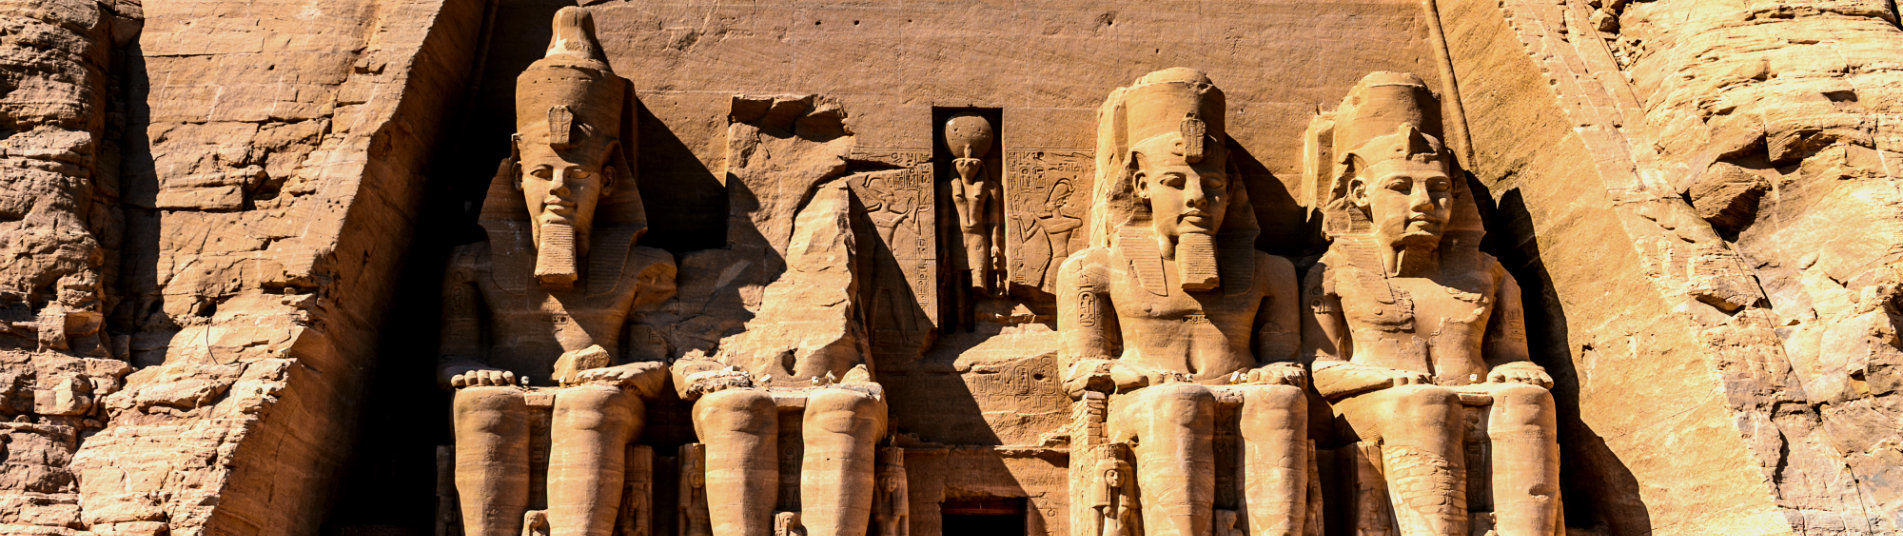 Temple Abou Simbel Egypte